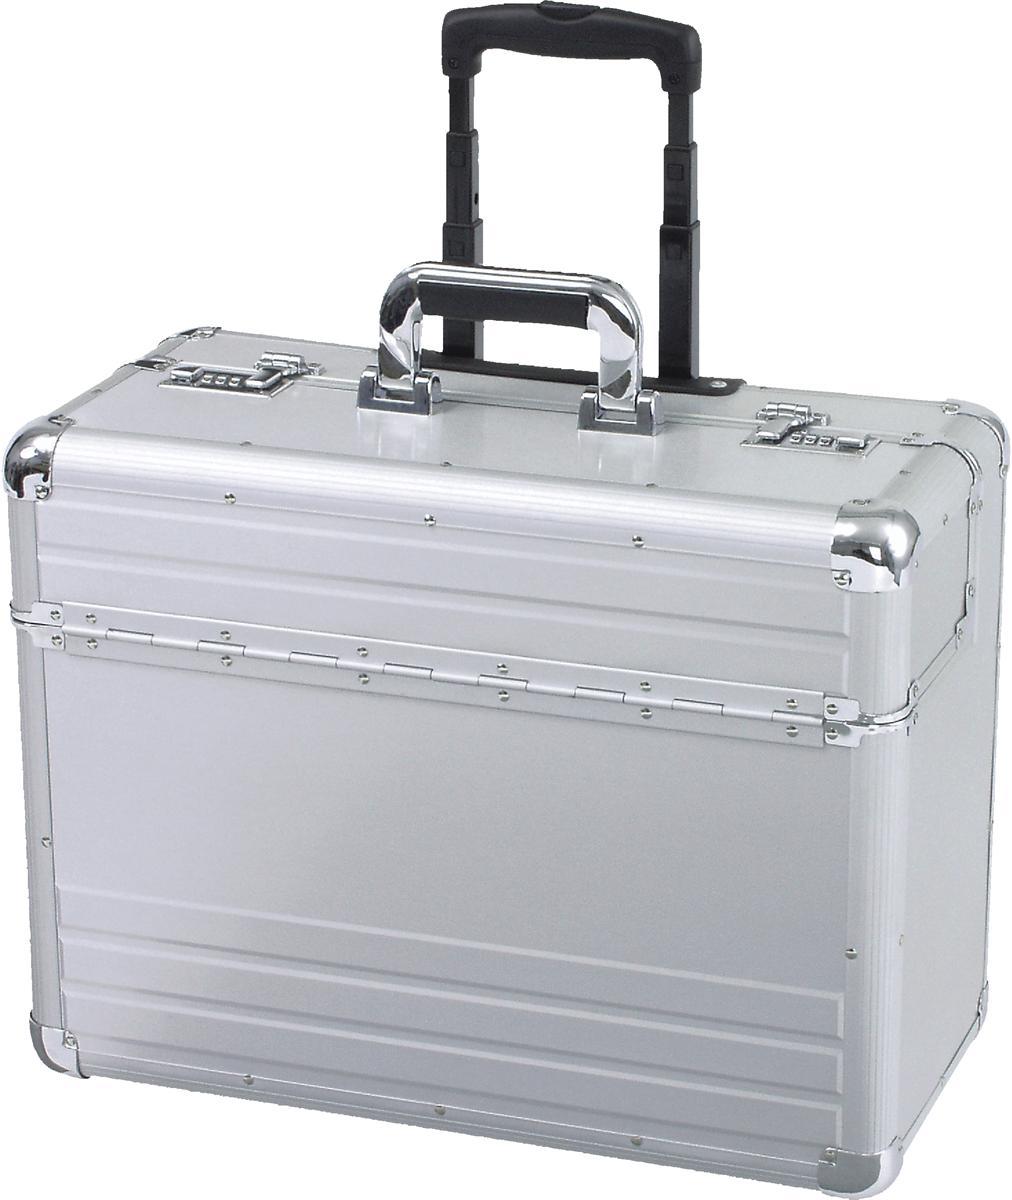 95d29e4bb32 Image for Alumaxx Omega Trolley Pilot Case 2 Combination Locks 5.3kg Silver  Aluminium Ref 45122